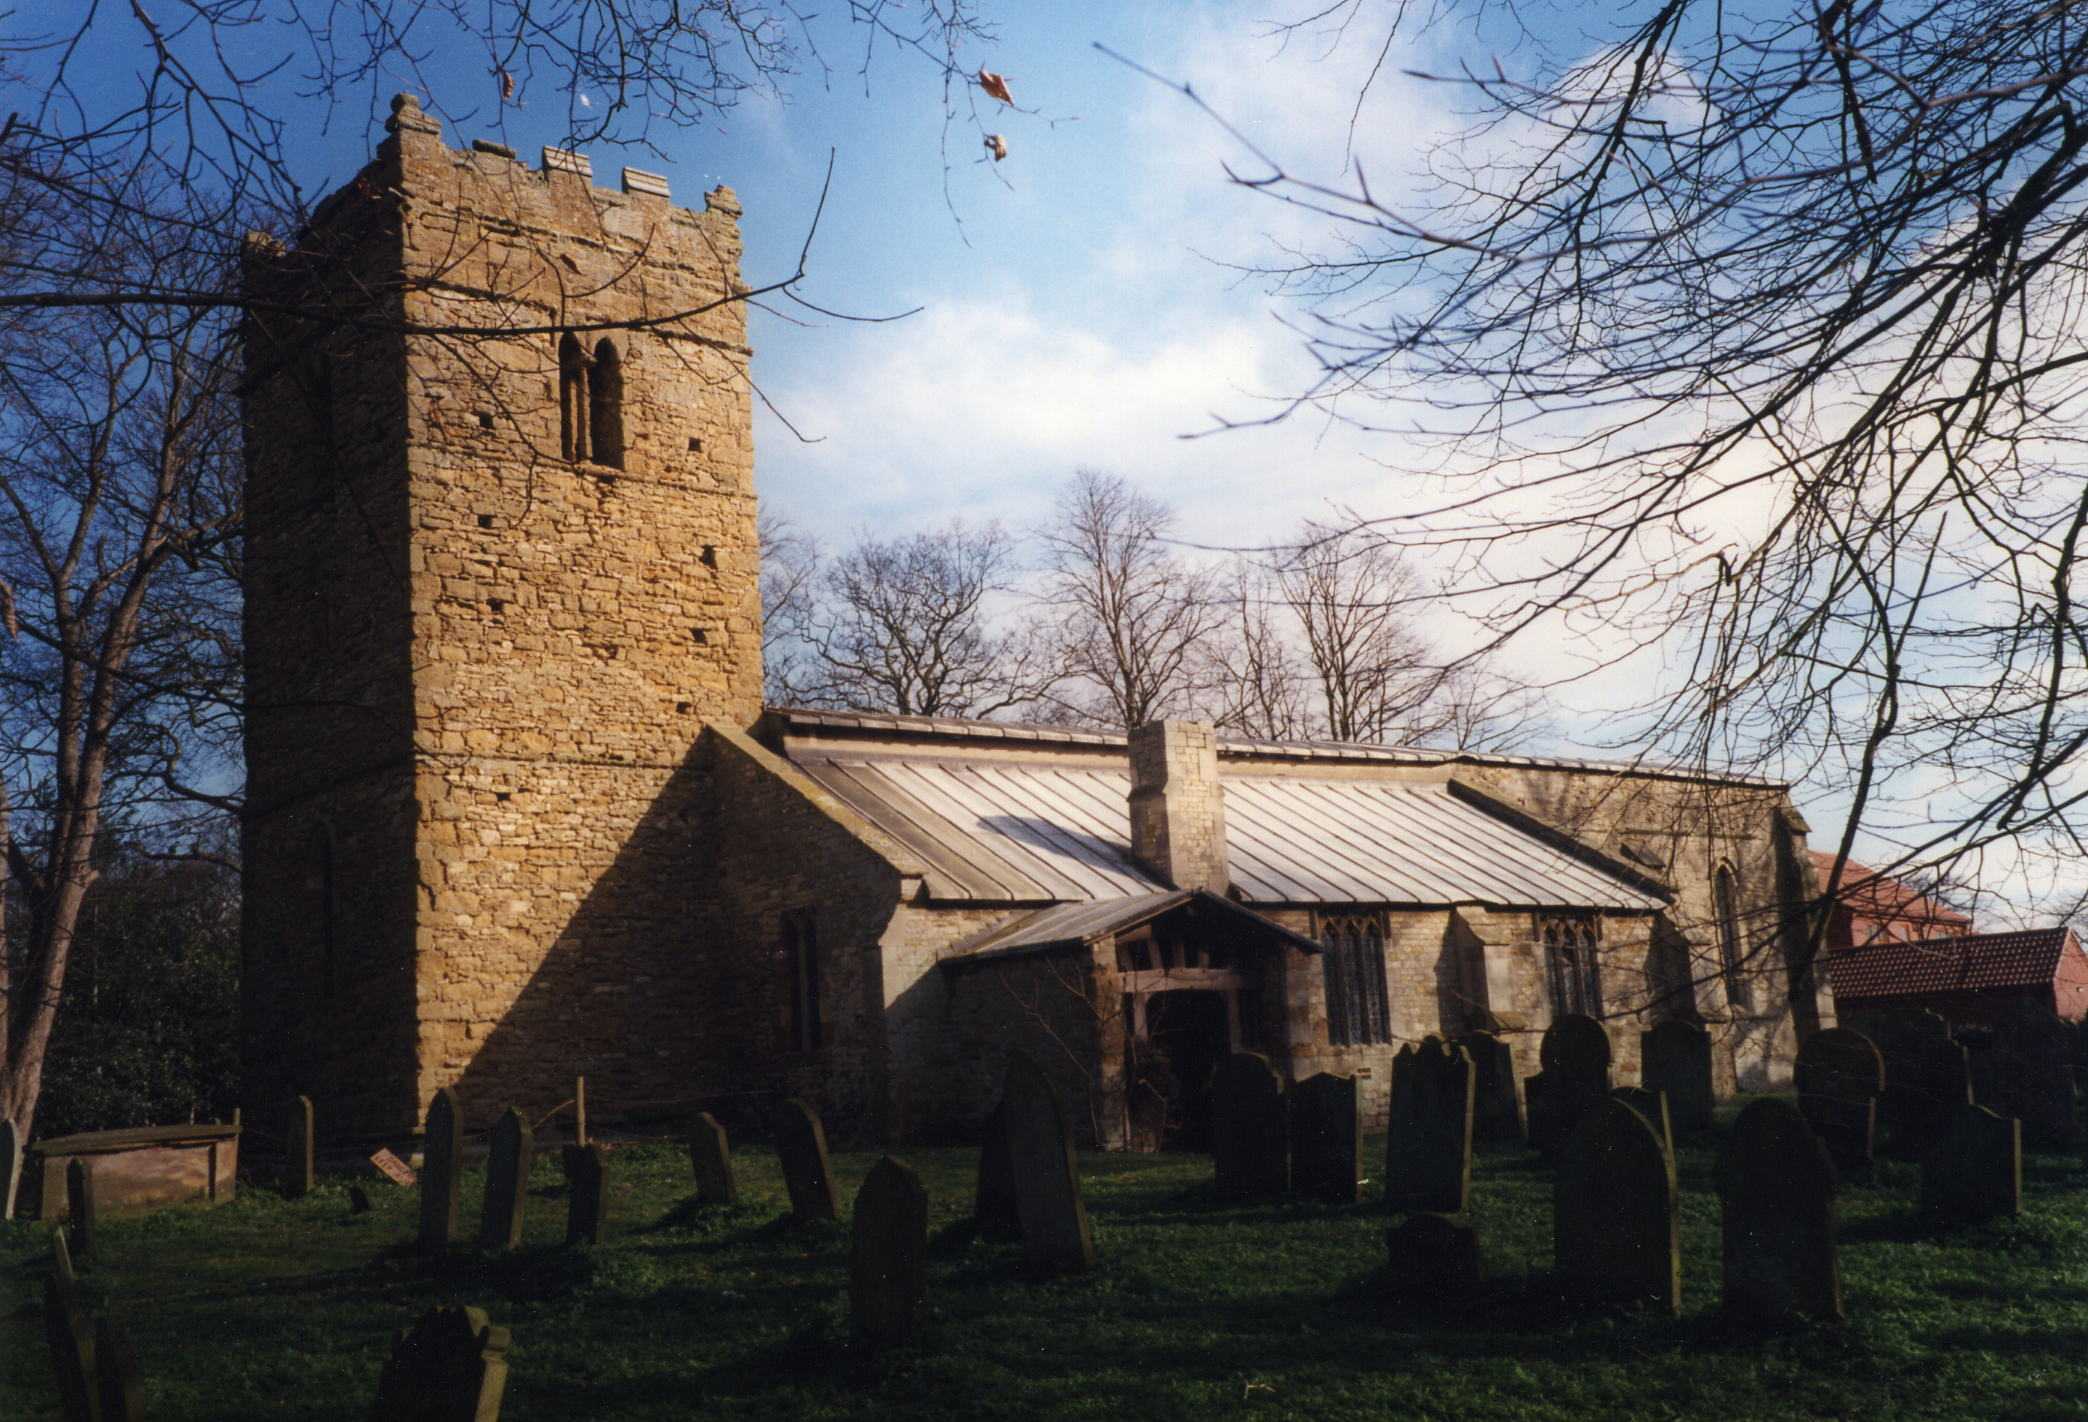 Cadney All Saints parish church